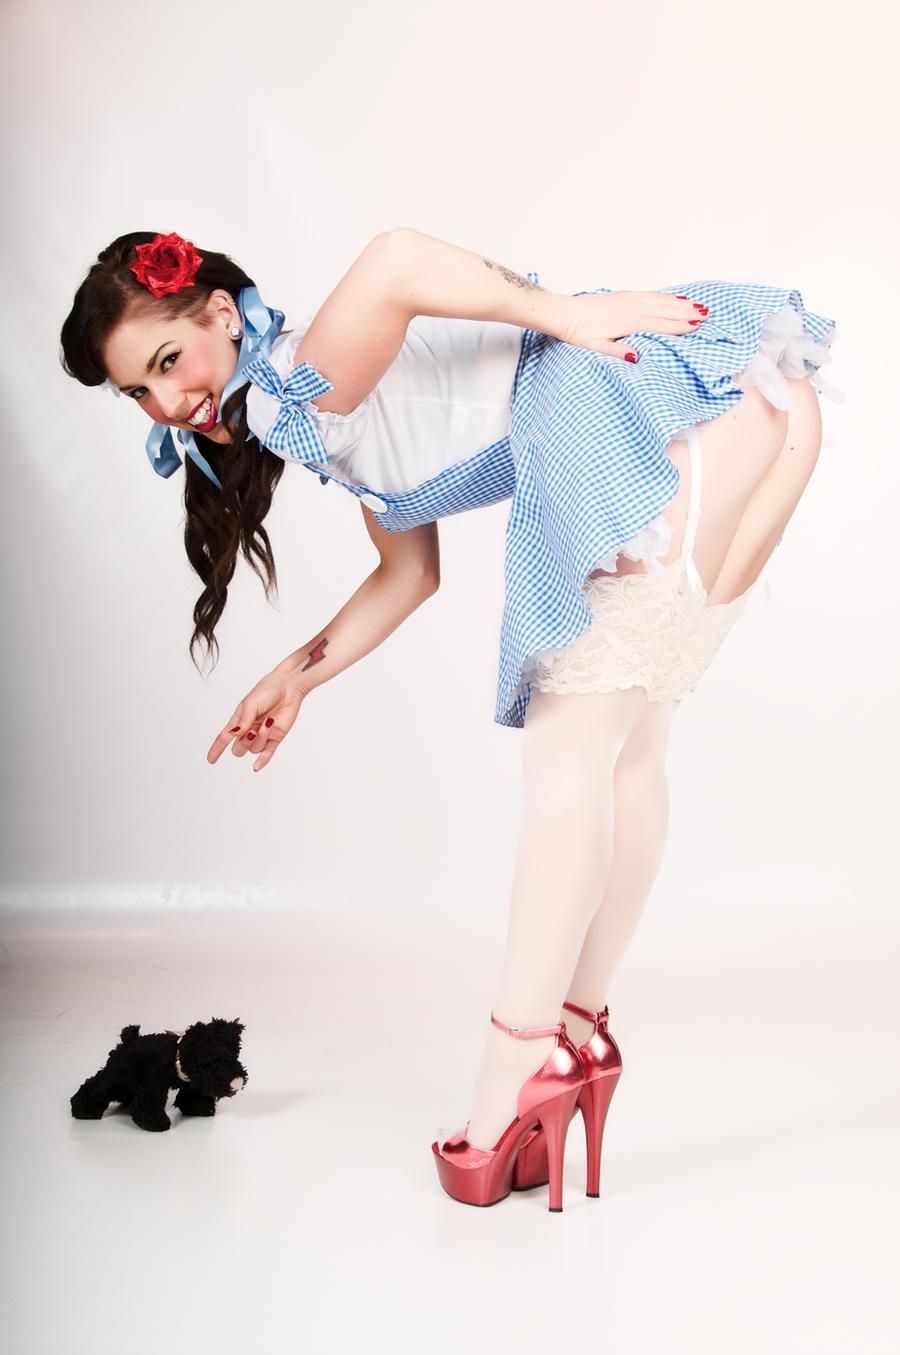 Dorothy Gone Bad-2 by Foto-Retro